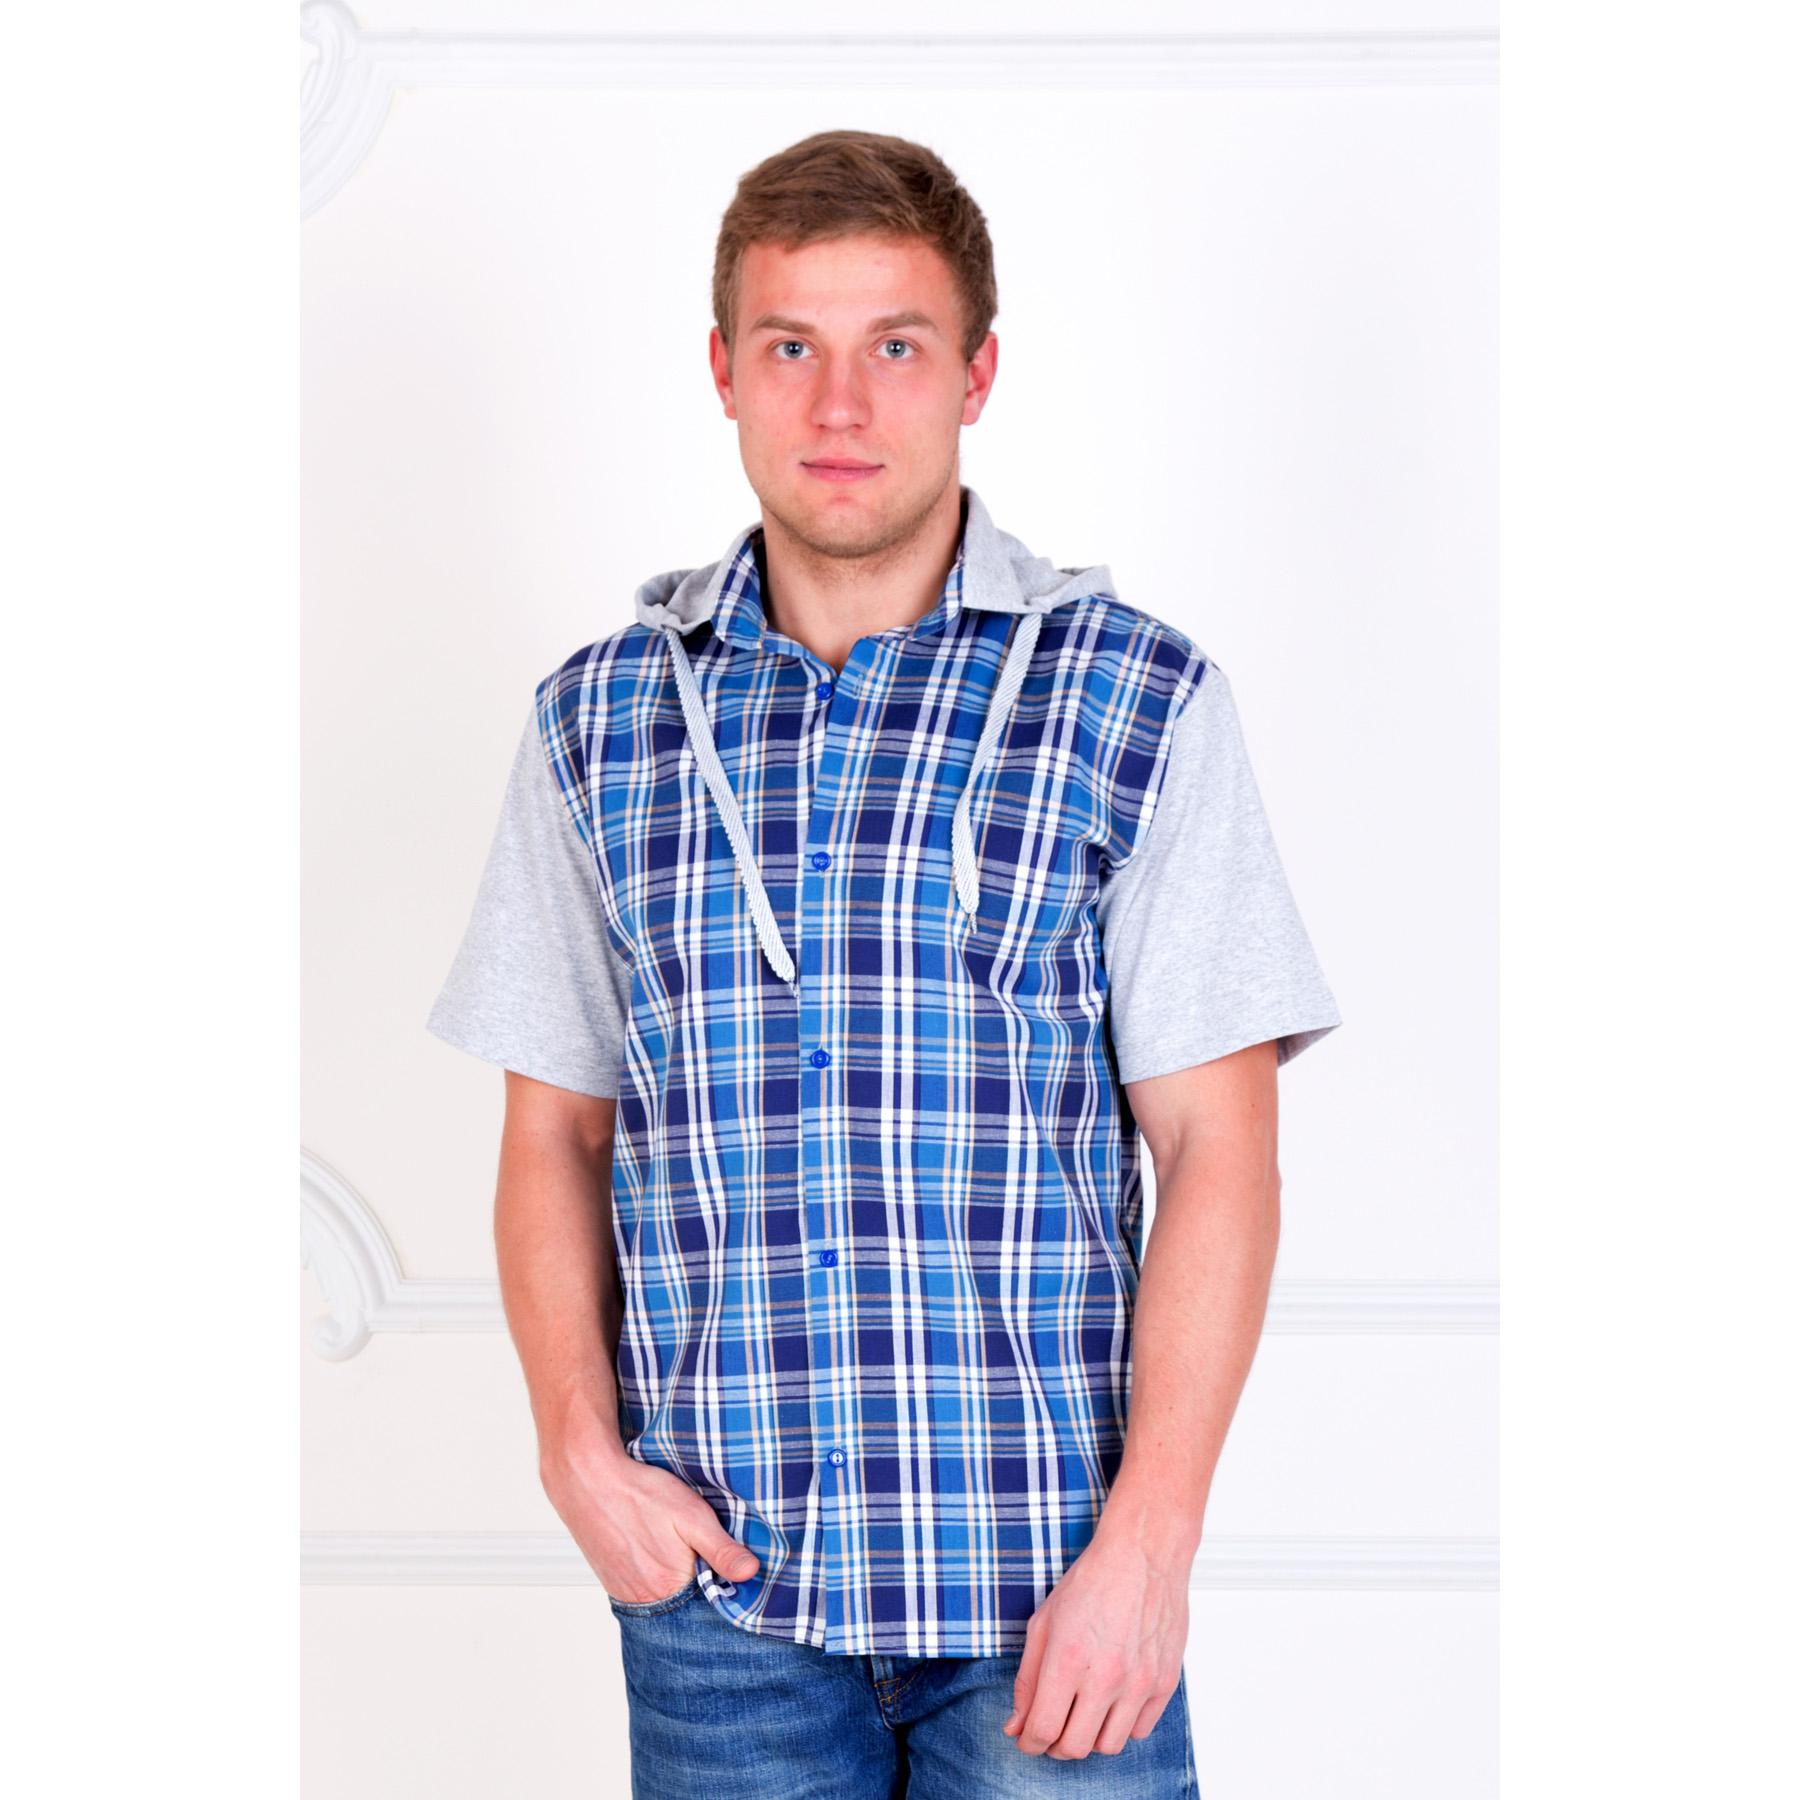 Мужская рубашка «Юстин» арт. 0031, размер 44 - Мужская одежда артикул: 16681